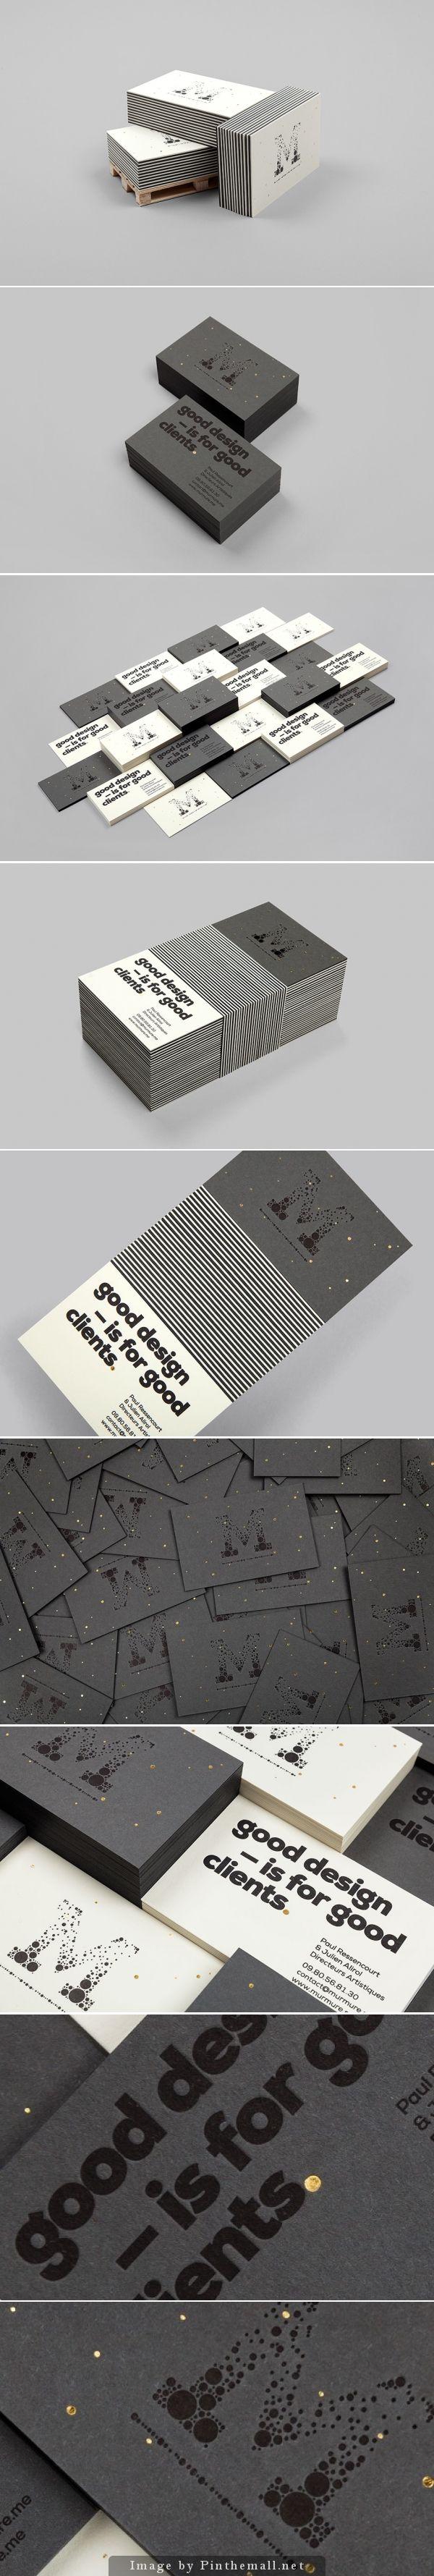 Biz card / Good design by Murmure